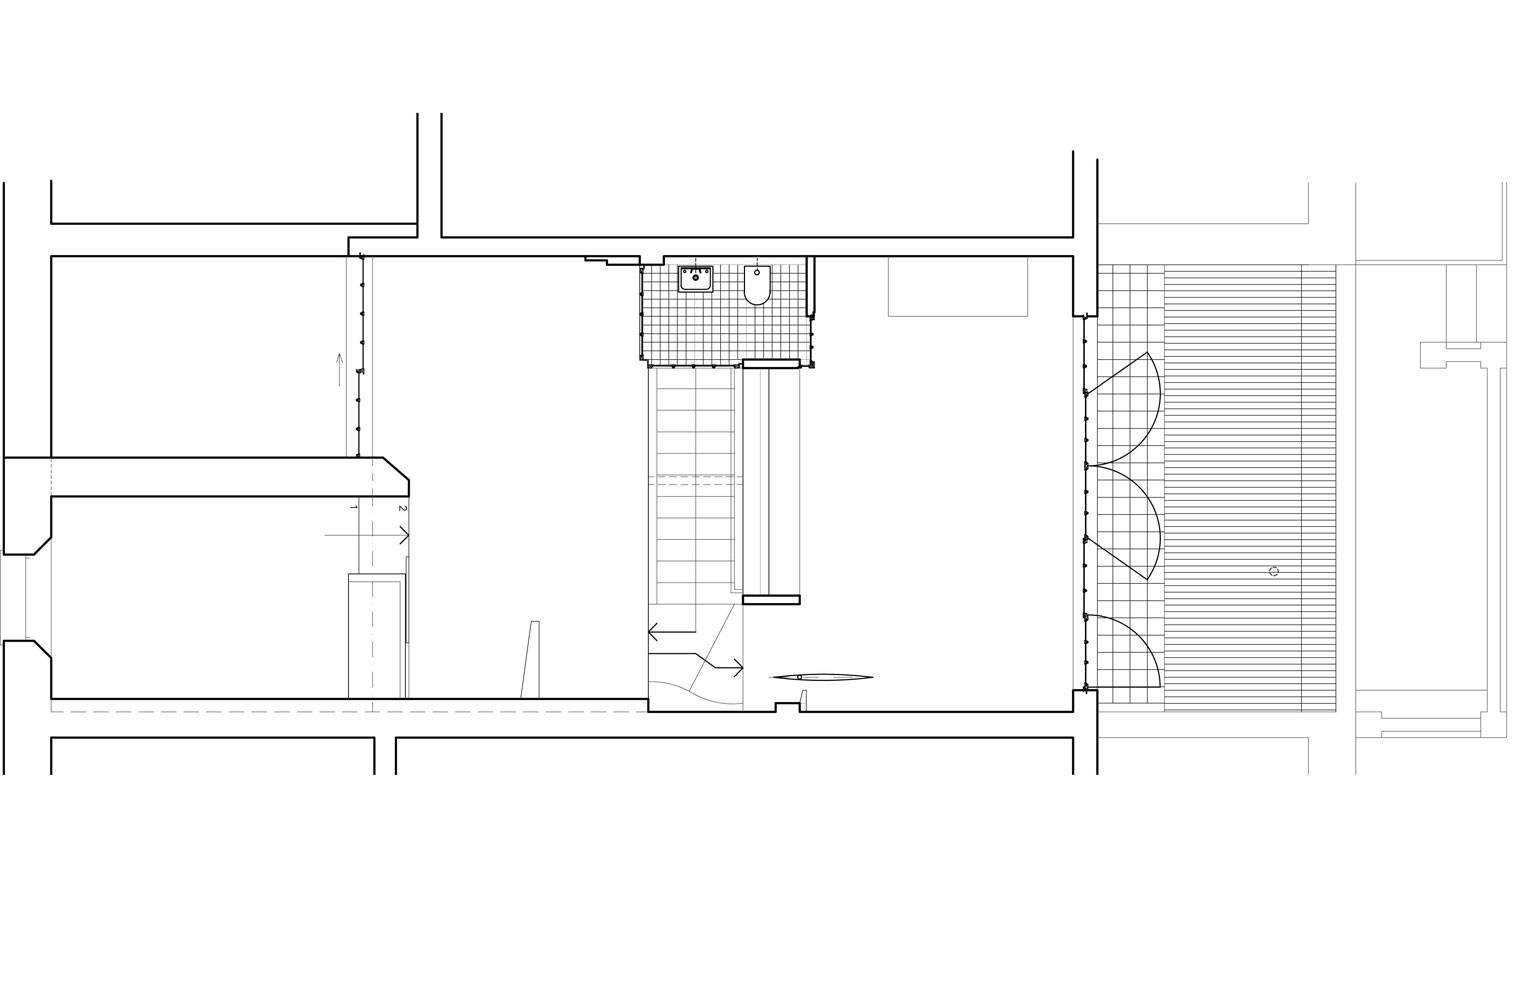 45 Leeuwen Street - First Floor Plan